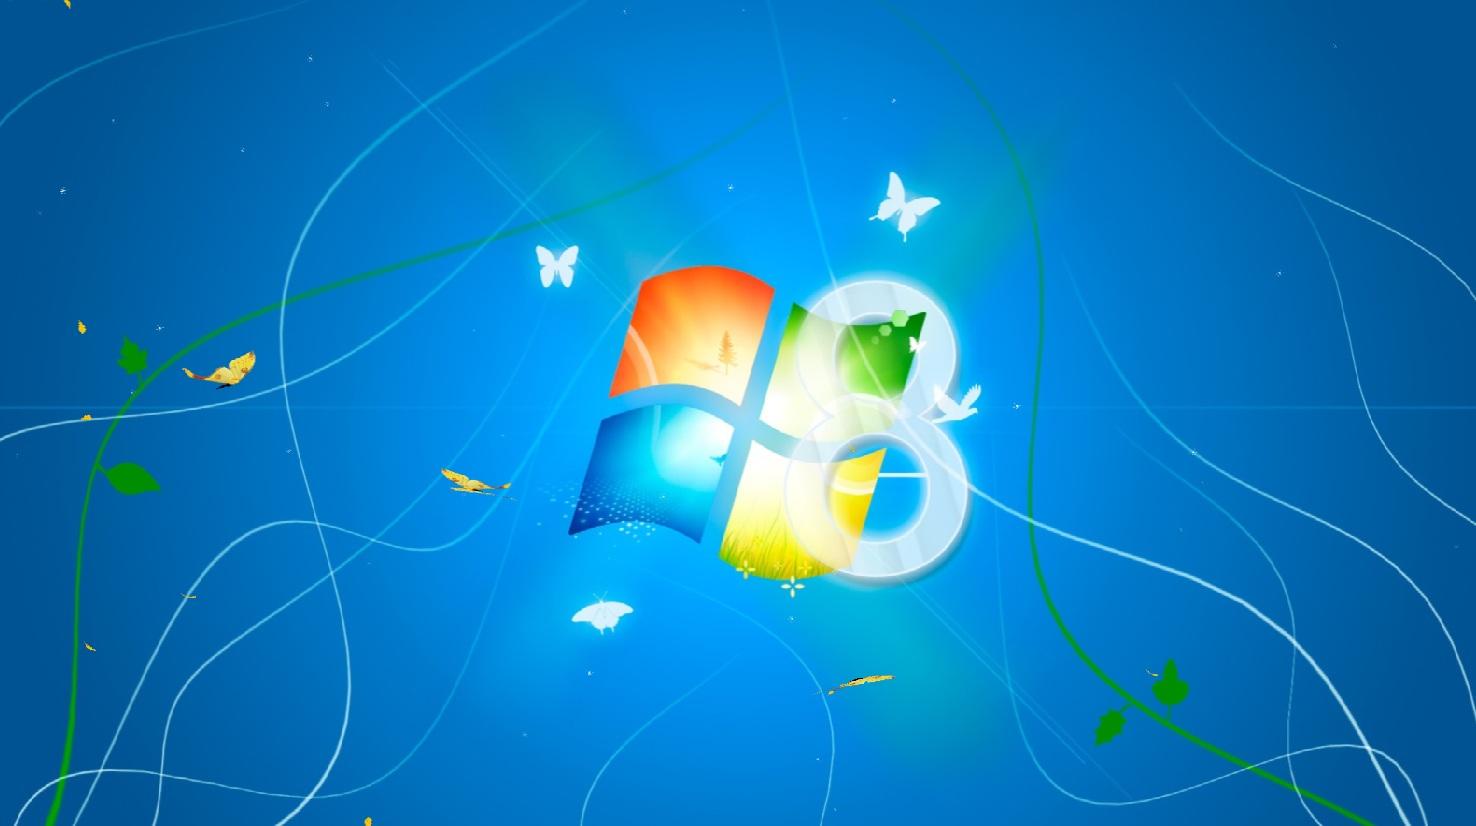 Windows 8 Light Animated Wallpaper full Windows 7 screenshot   Windows 1476x826